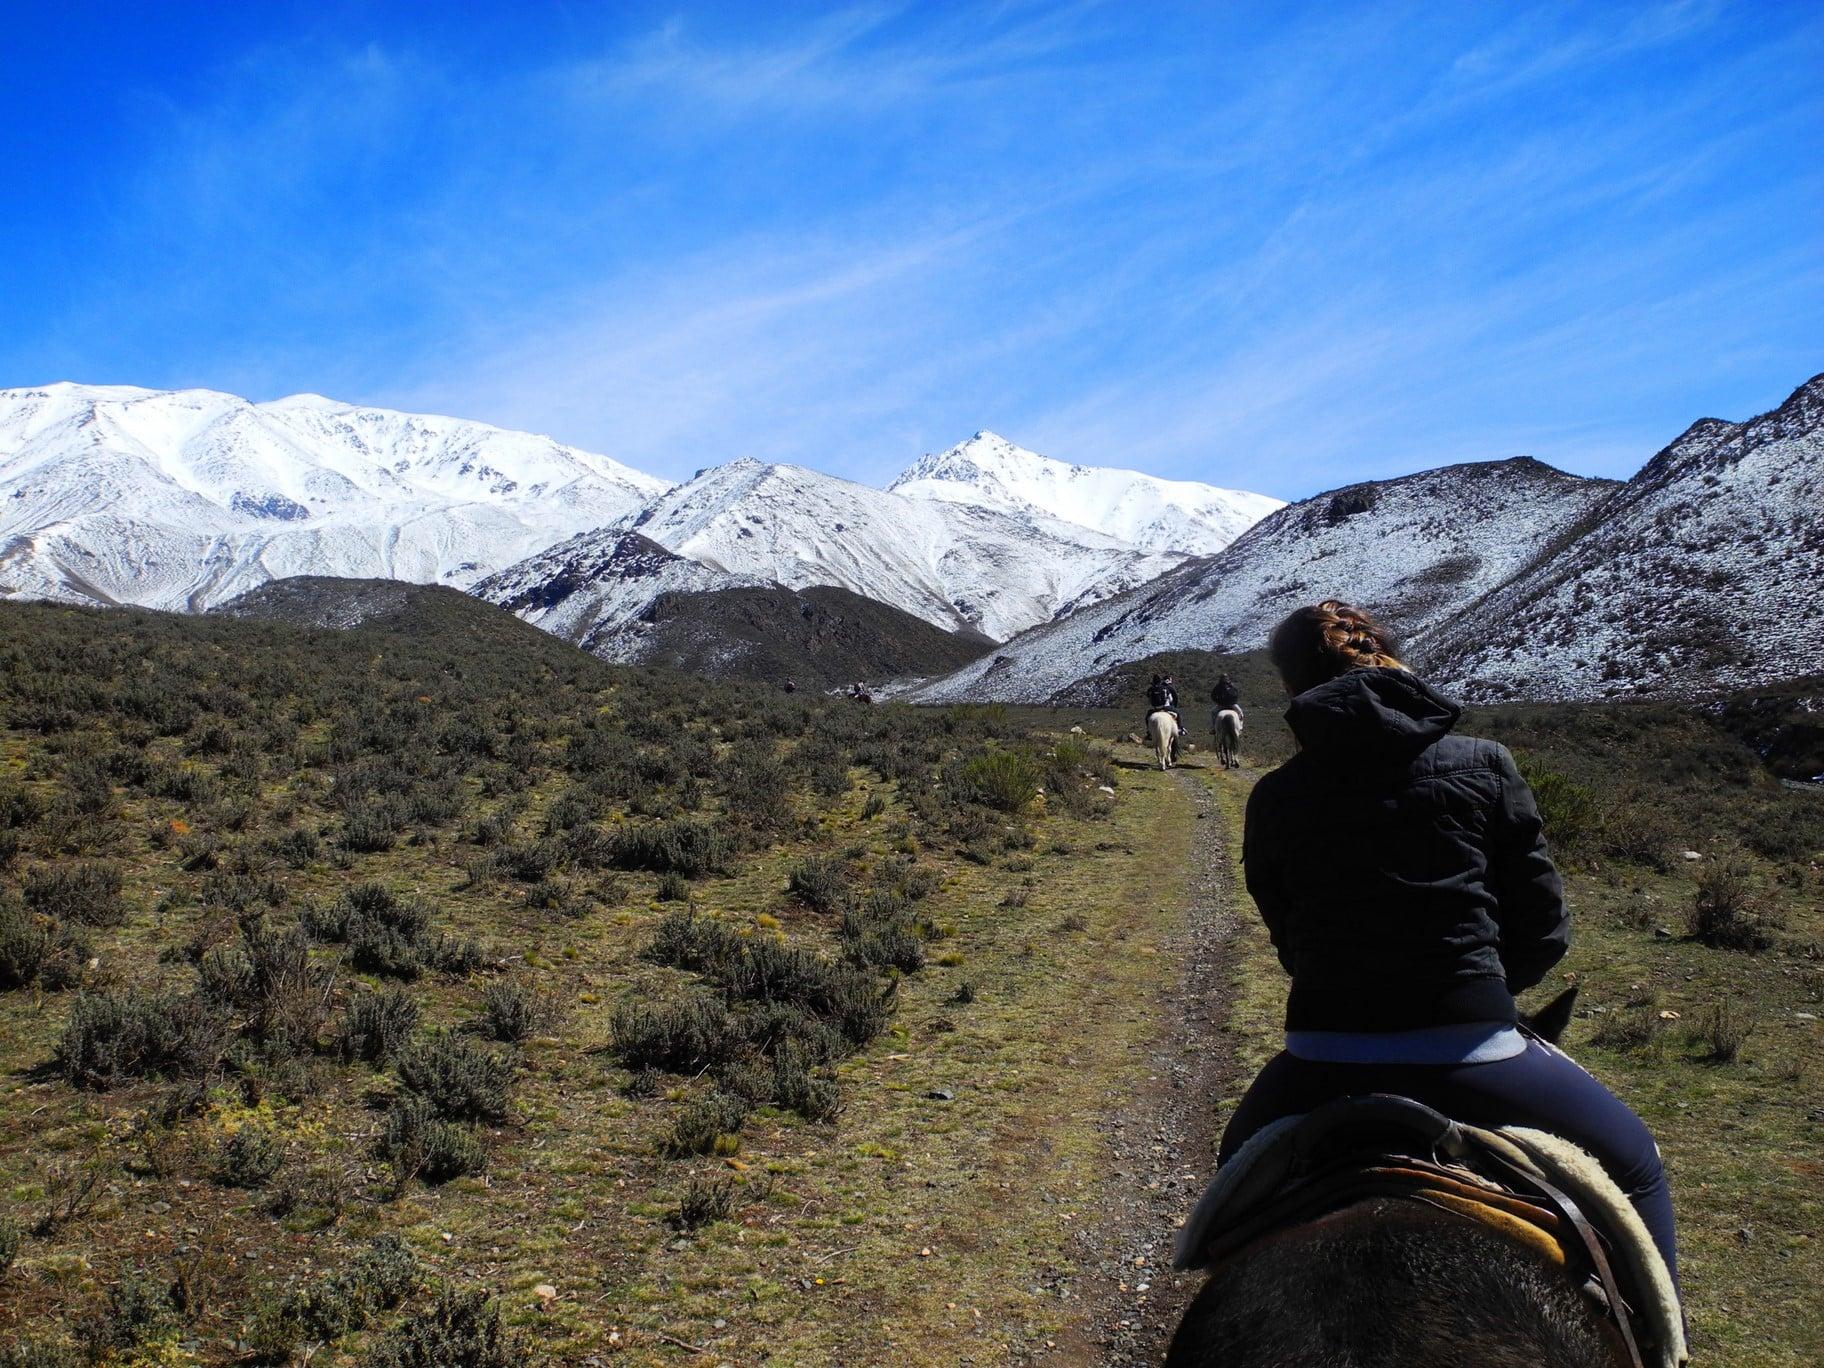 wine-TROTTERS_wine-tourism-agency_tour_trekking_hiking_horseback-riding_Andes_85 WEB.jpg